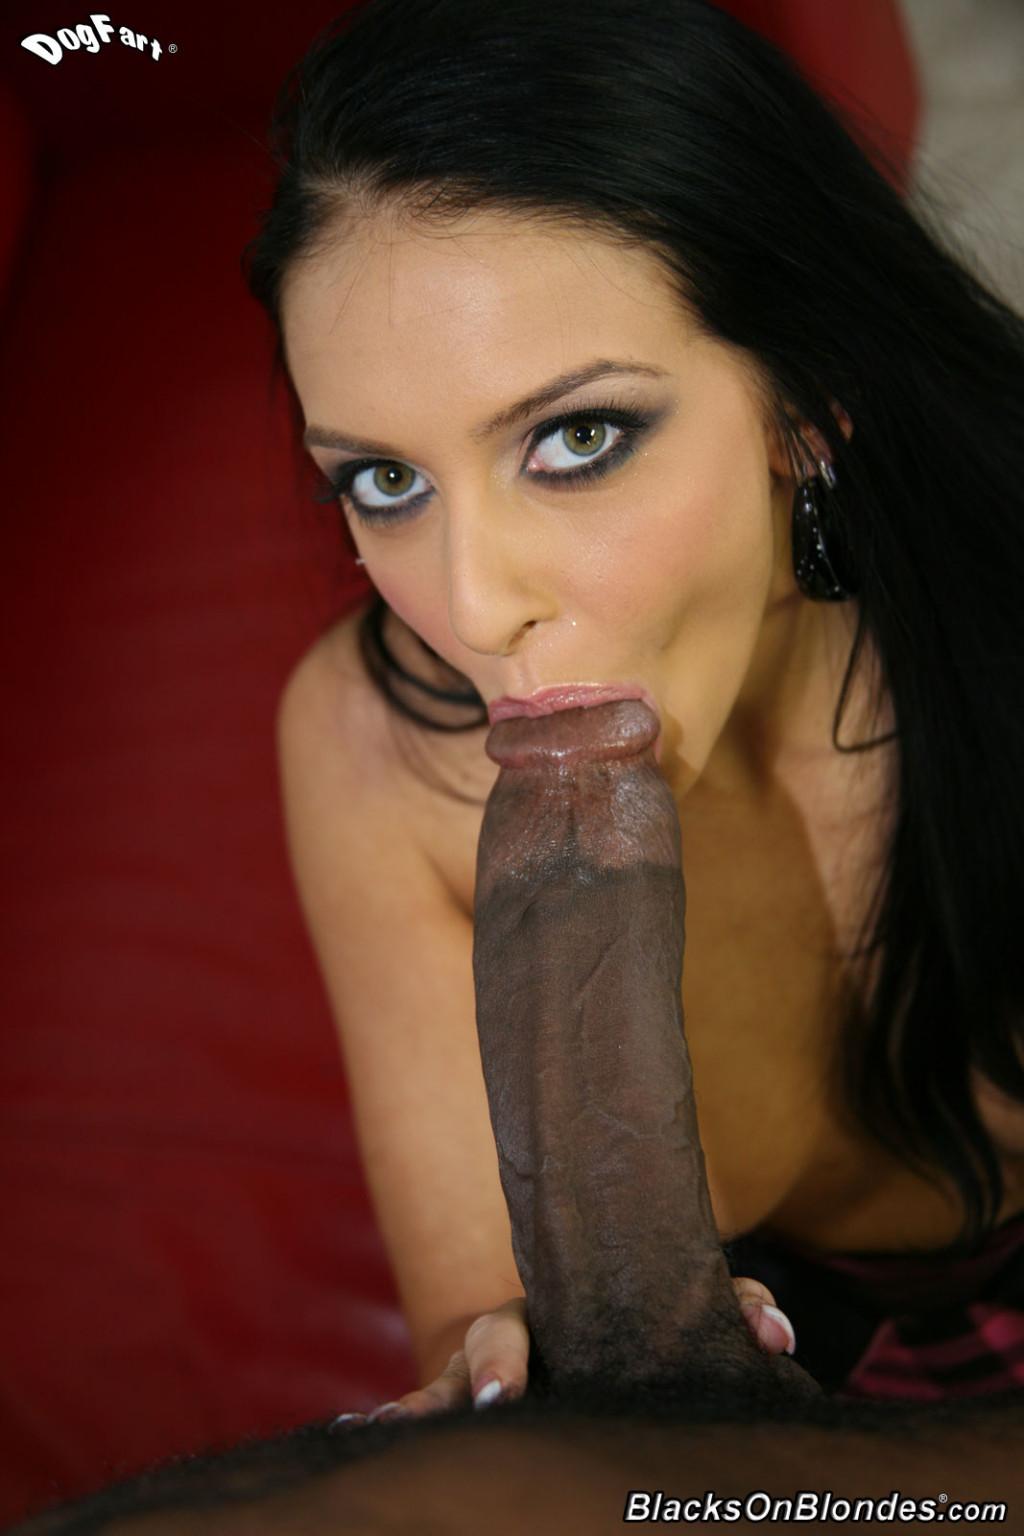 Stephanie cane interracial pornstar from dogfartnetwork